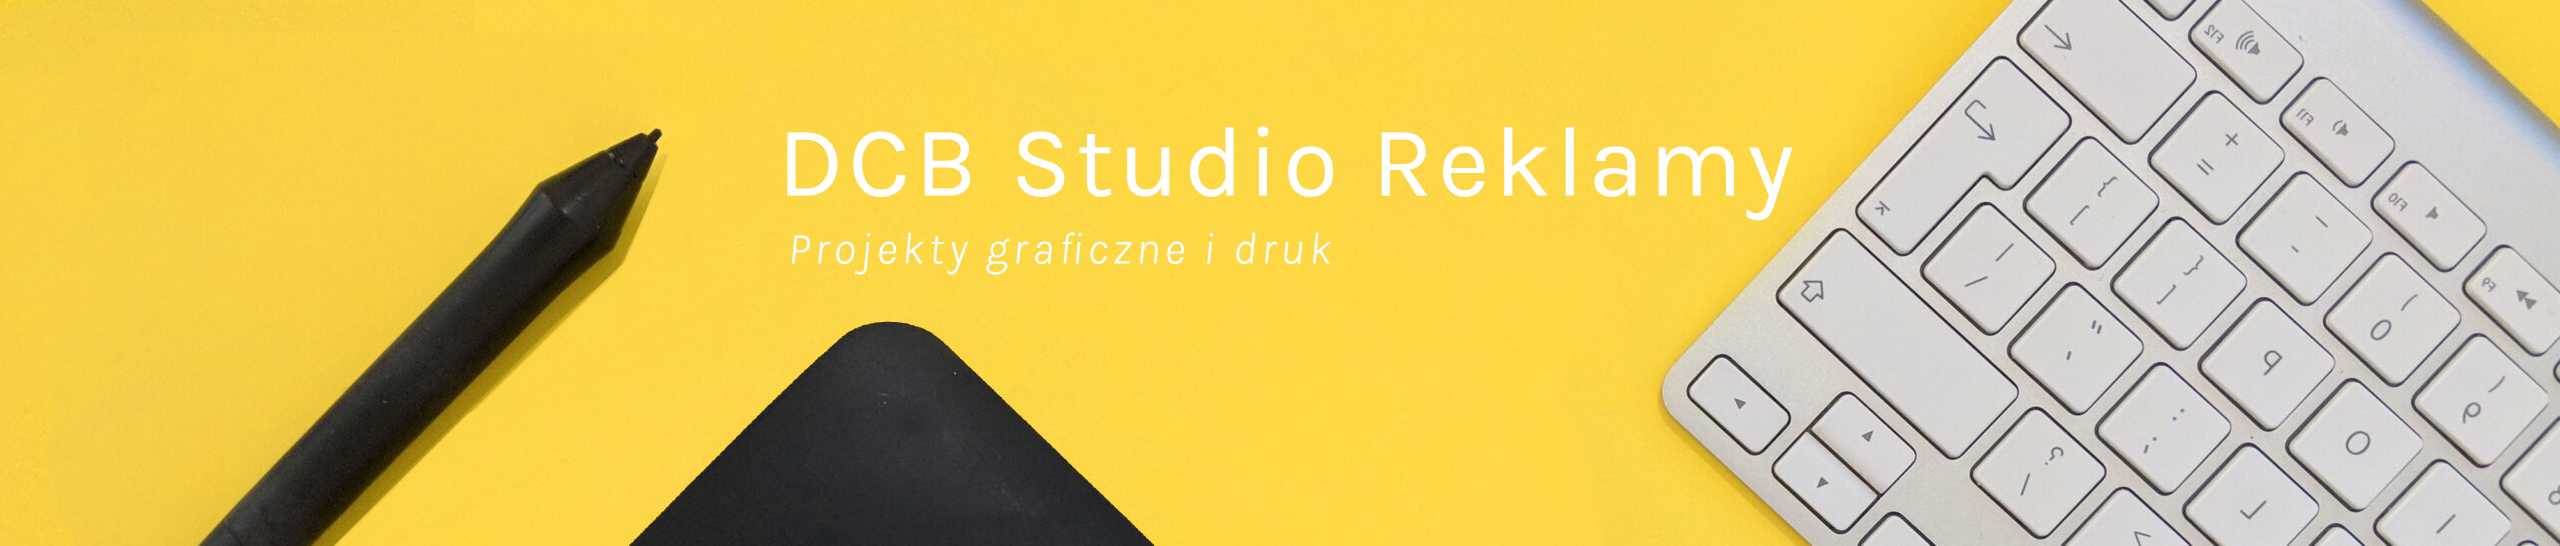 DCB Studio Reklamy